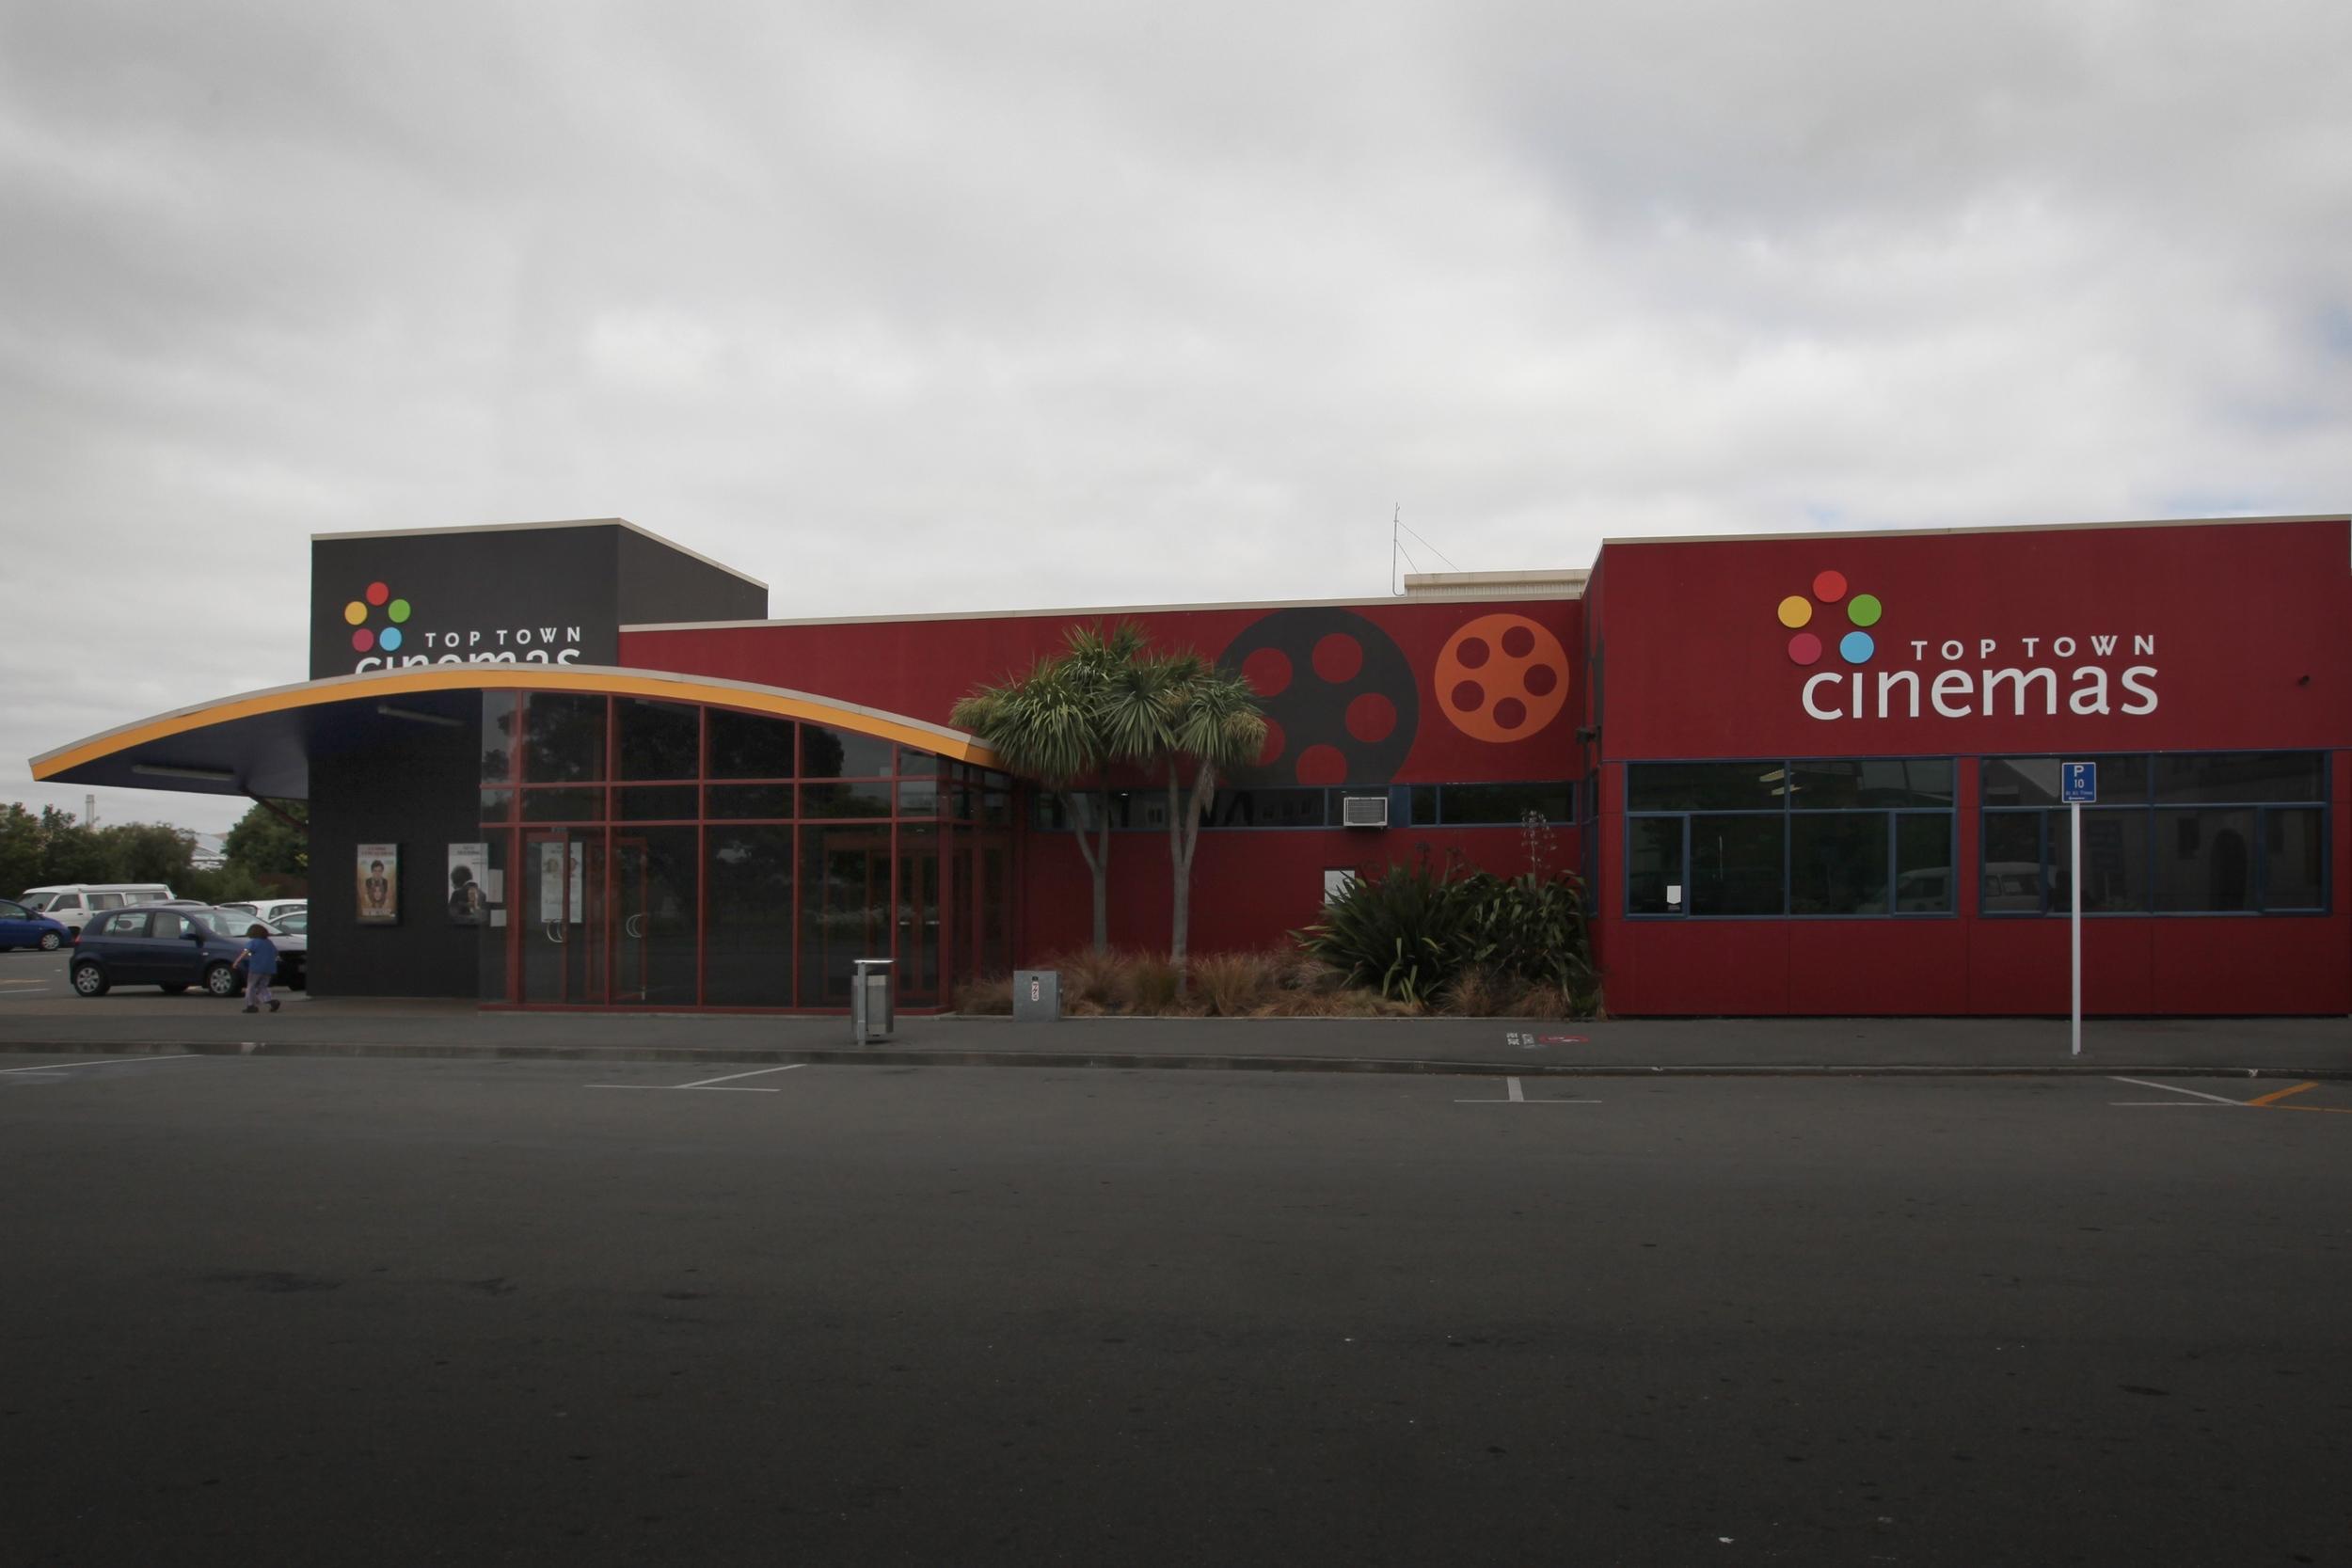 top town cinema.jpg